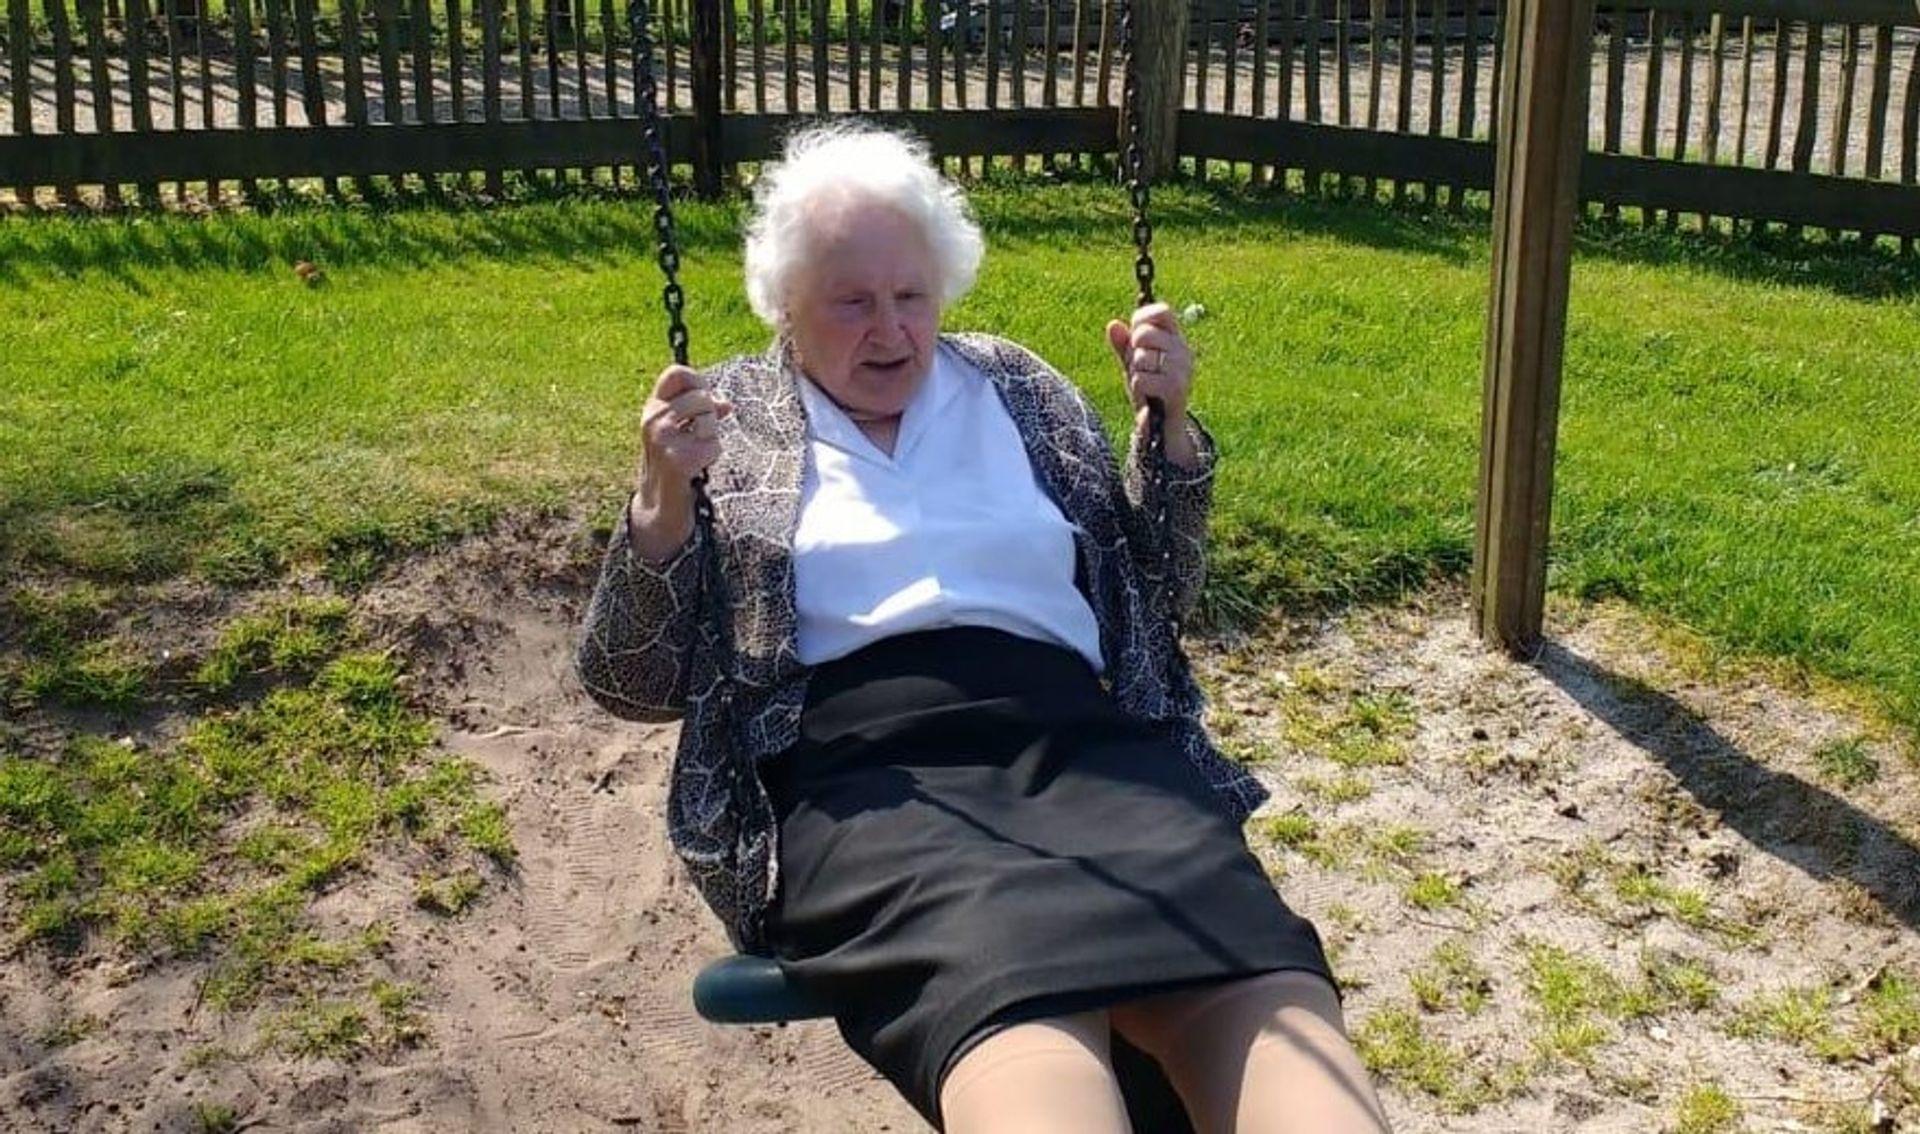 Oma Coba (93) kreeg slechts 1 boete in haar hele leven!